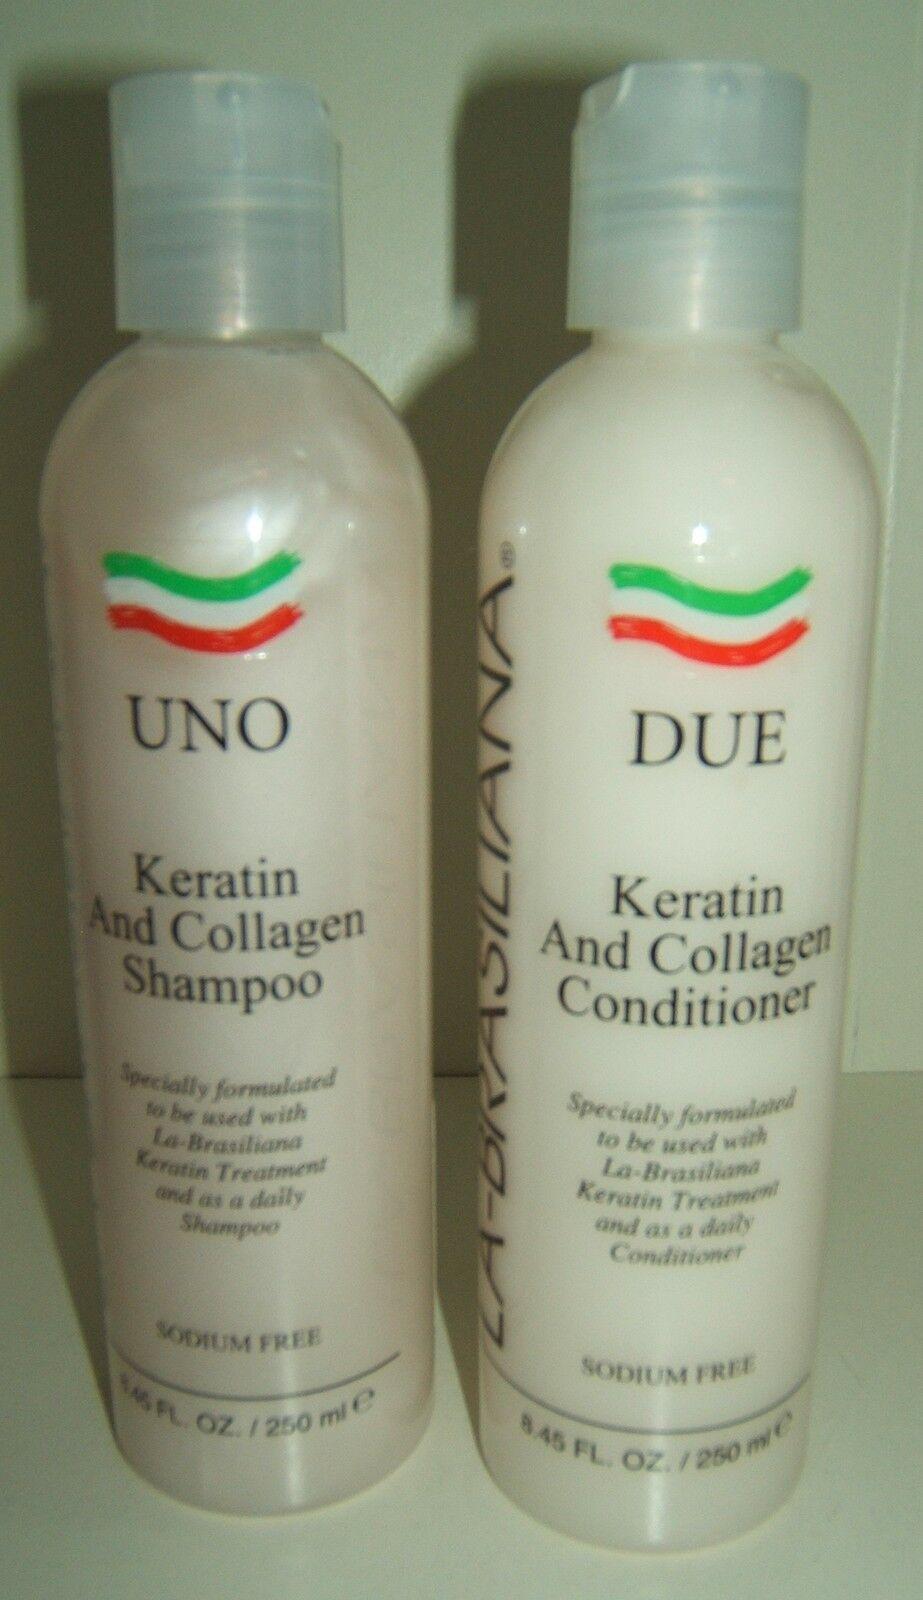 La Brasiliana Brazilian Keratin Treatment Aftercare Shampoo